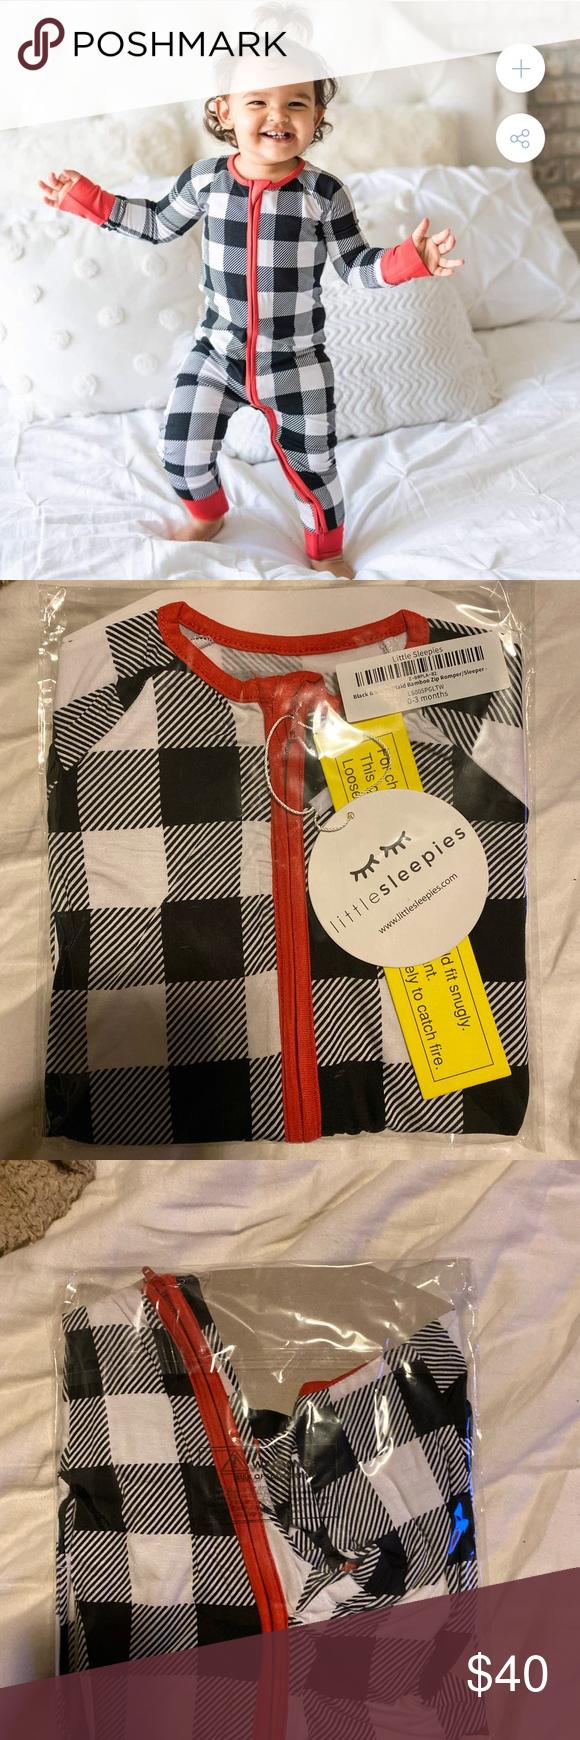 [Little Sleepies] Buffalo Plaid Zippy Pajamas Foldover